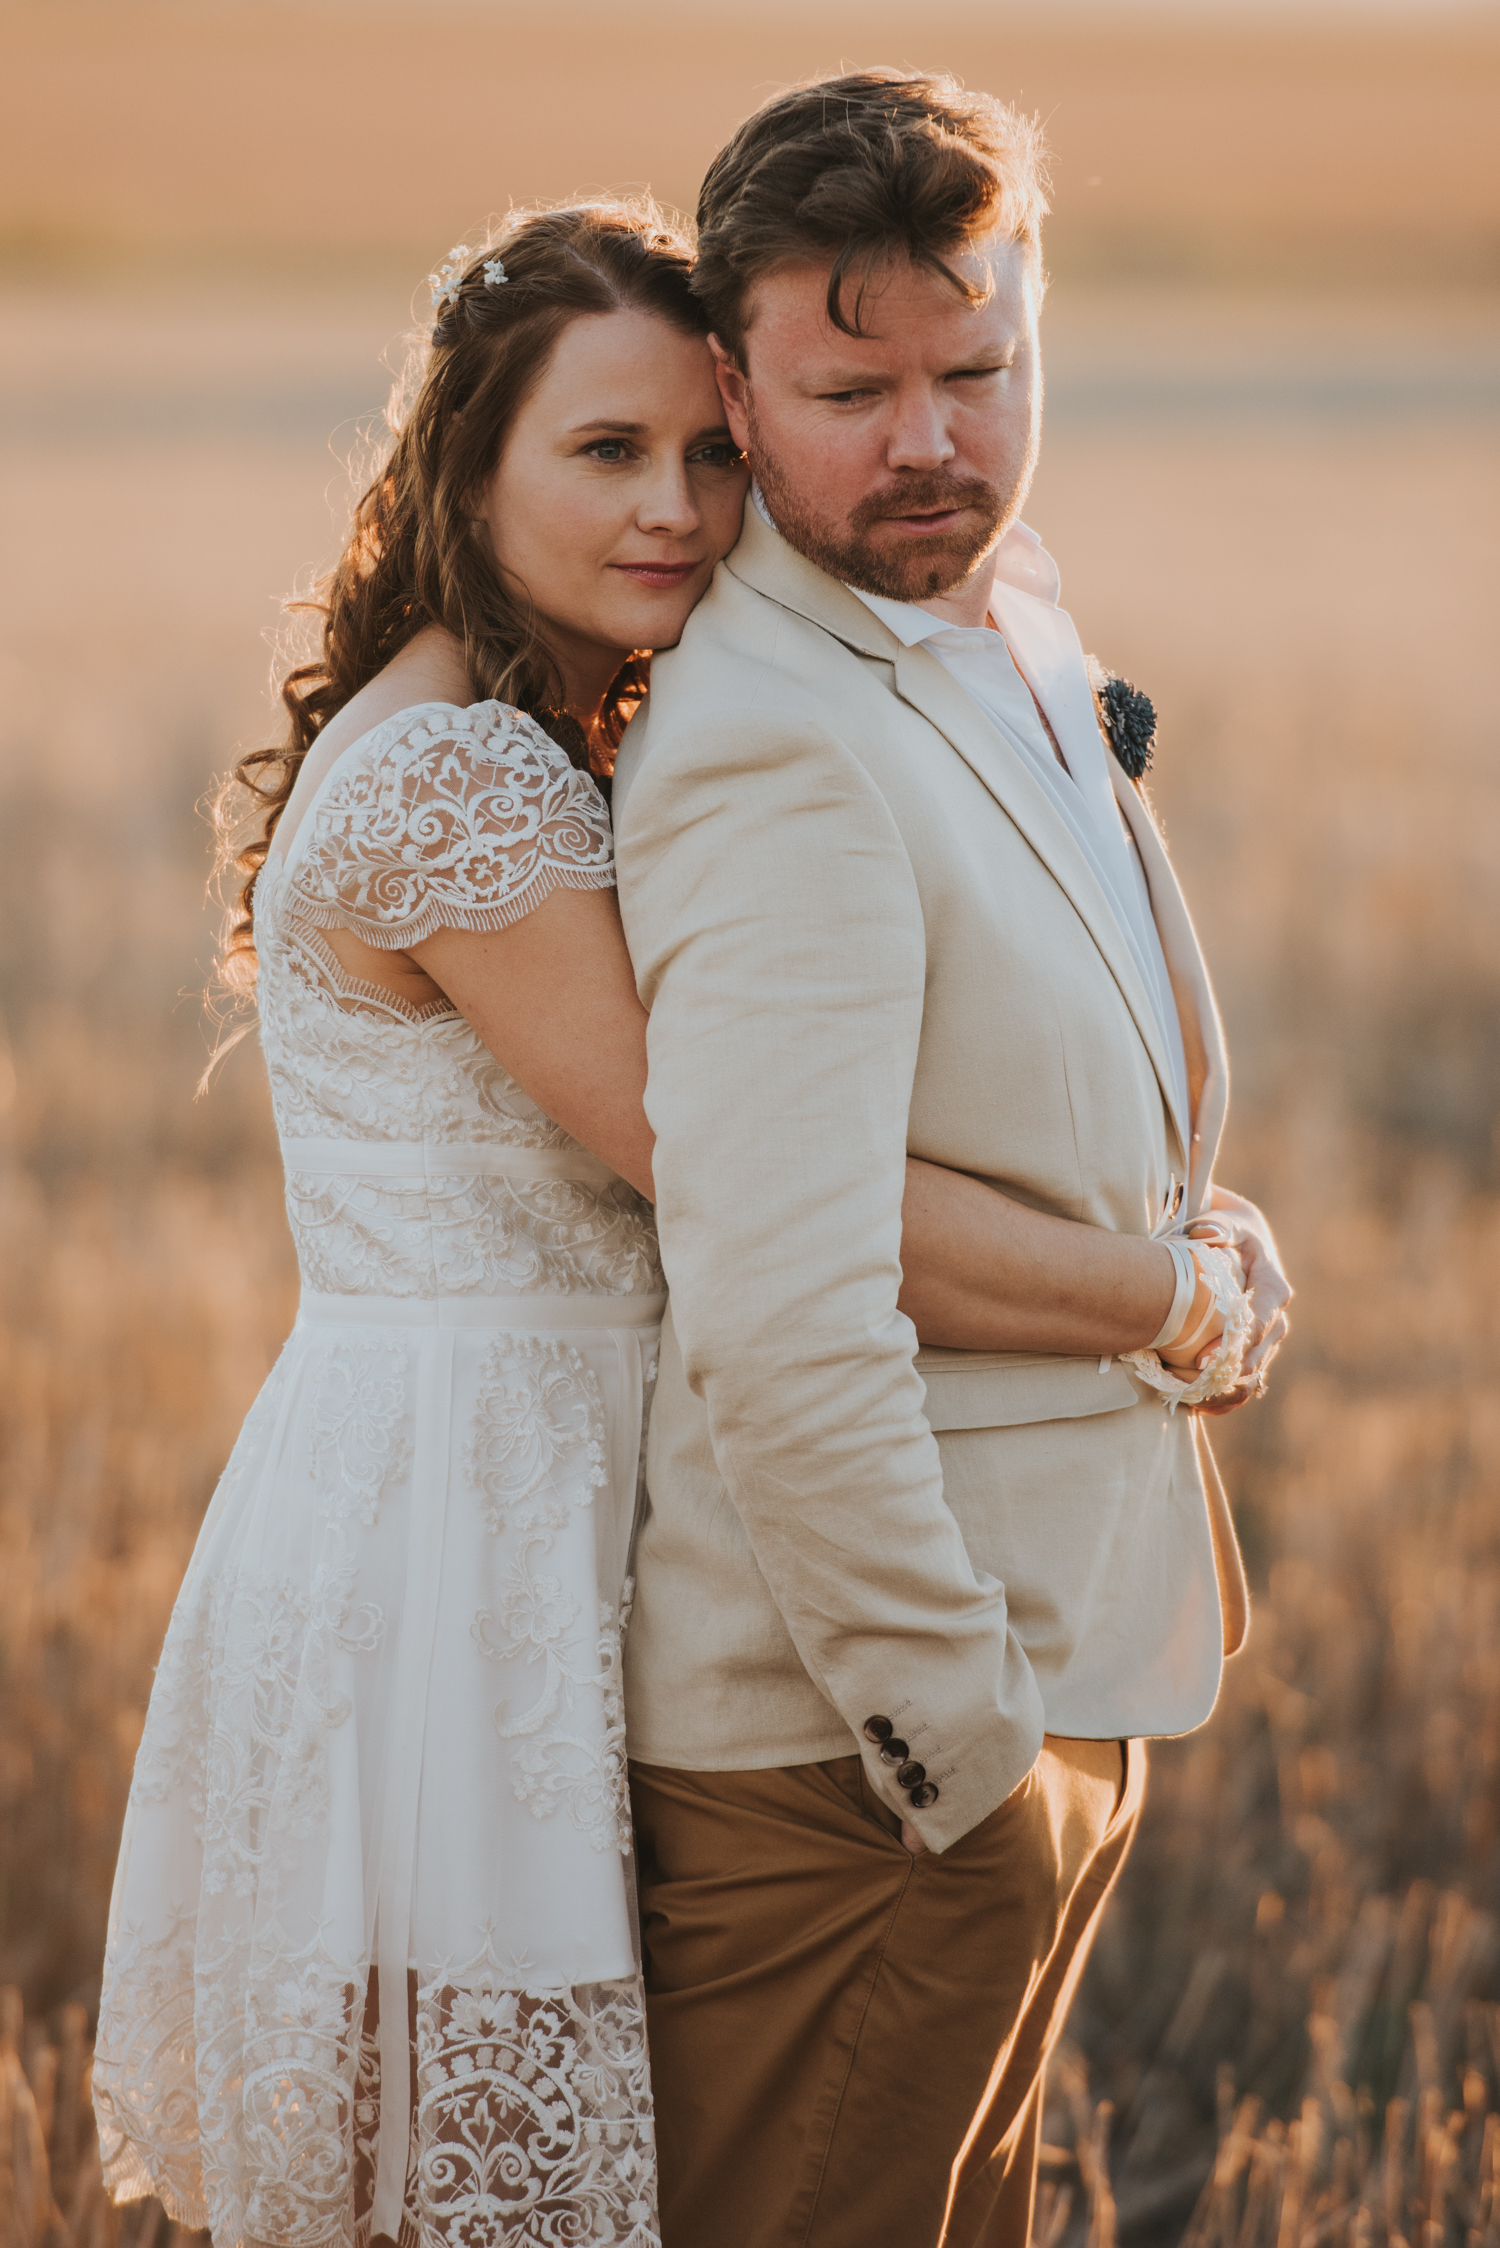 Brisbane Wedding Photographer | Engagement Photography-61.jpg